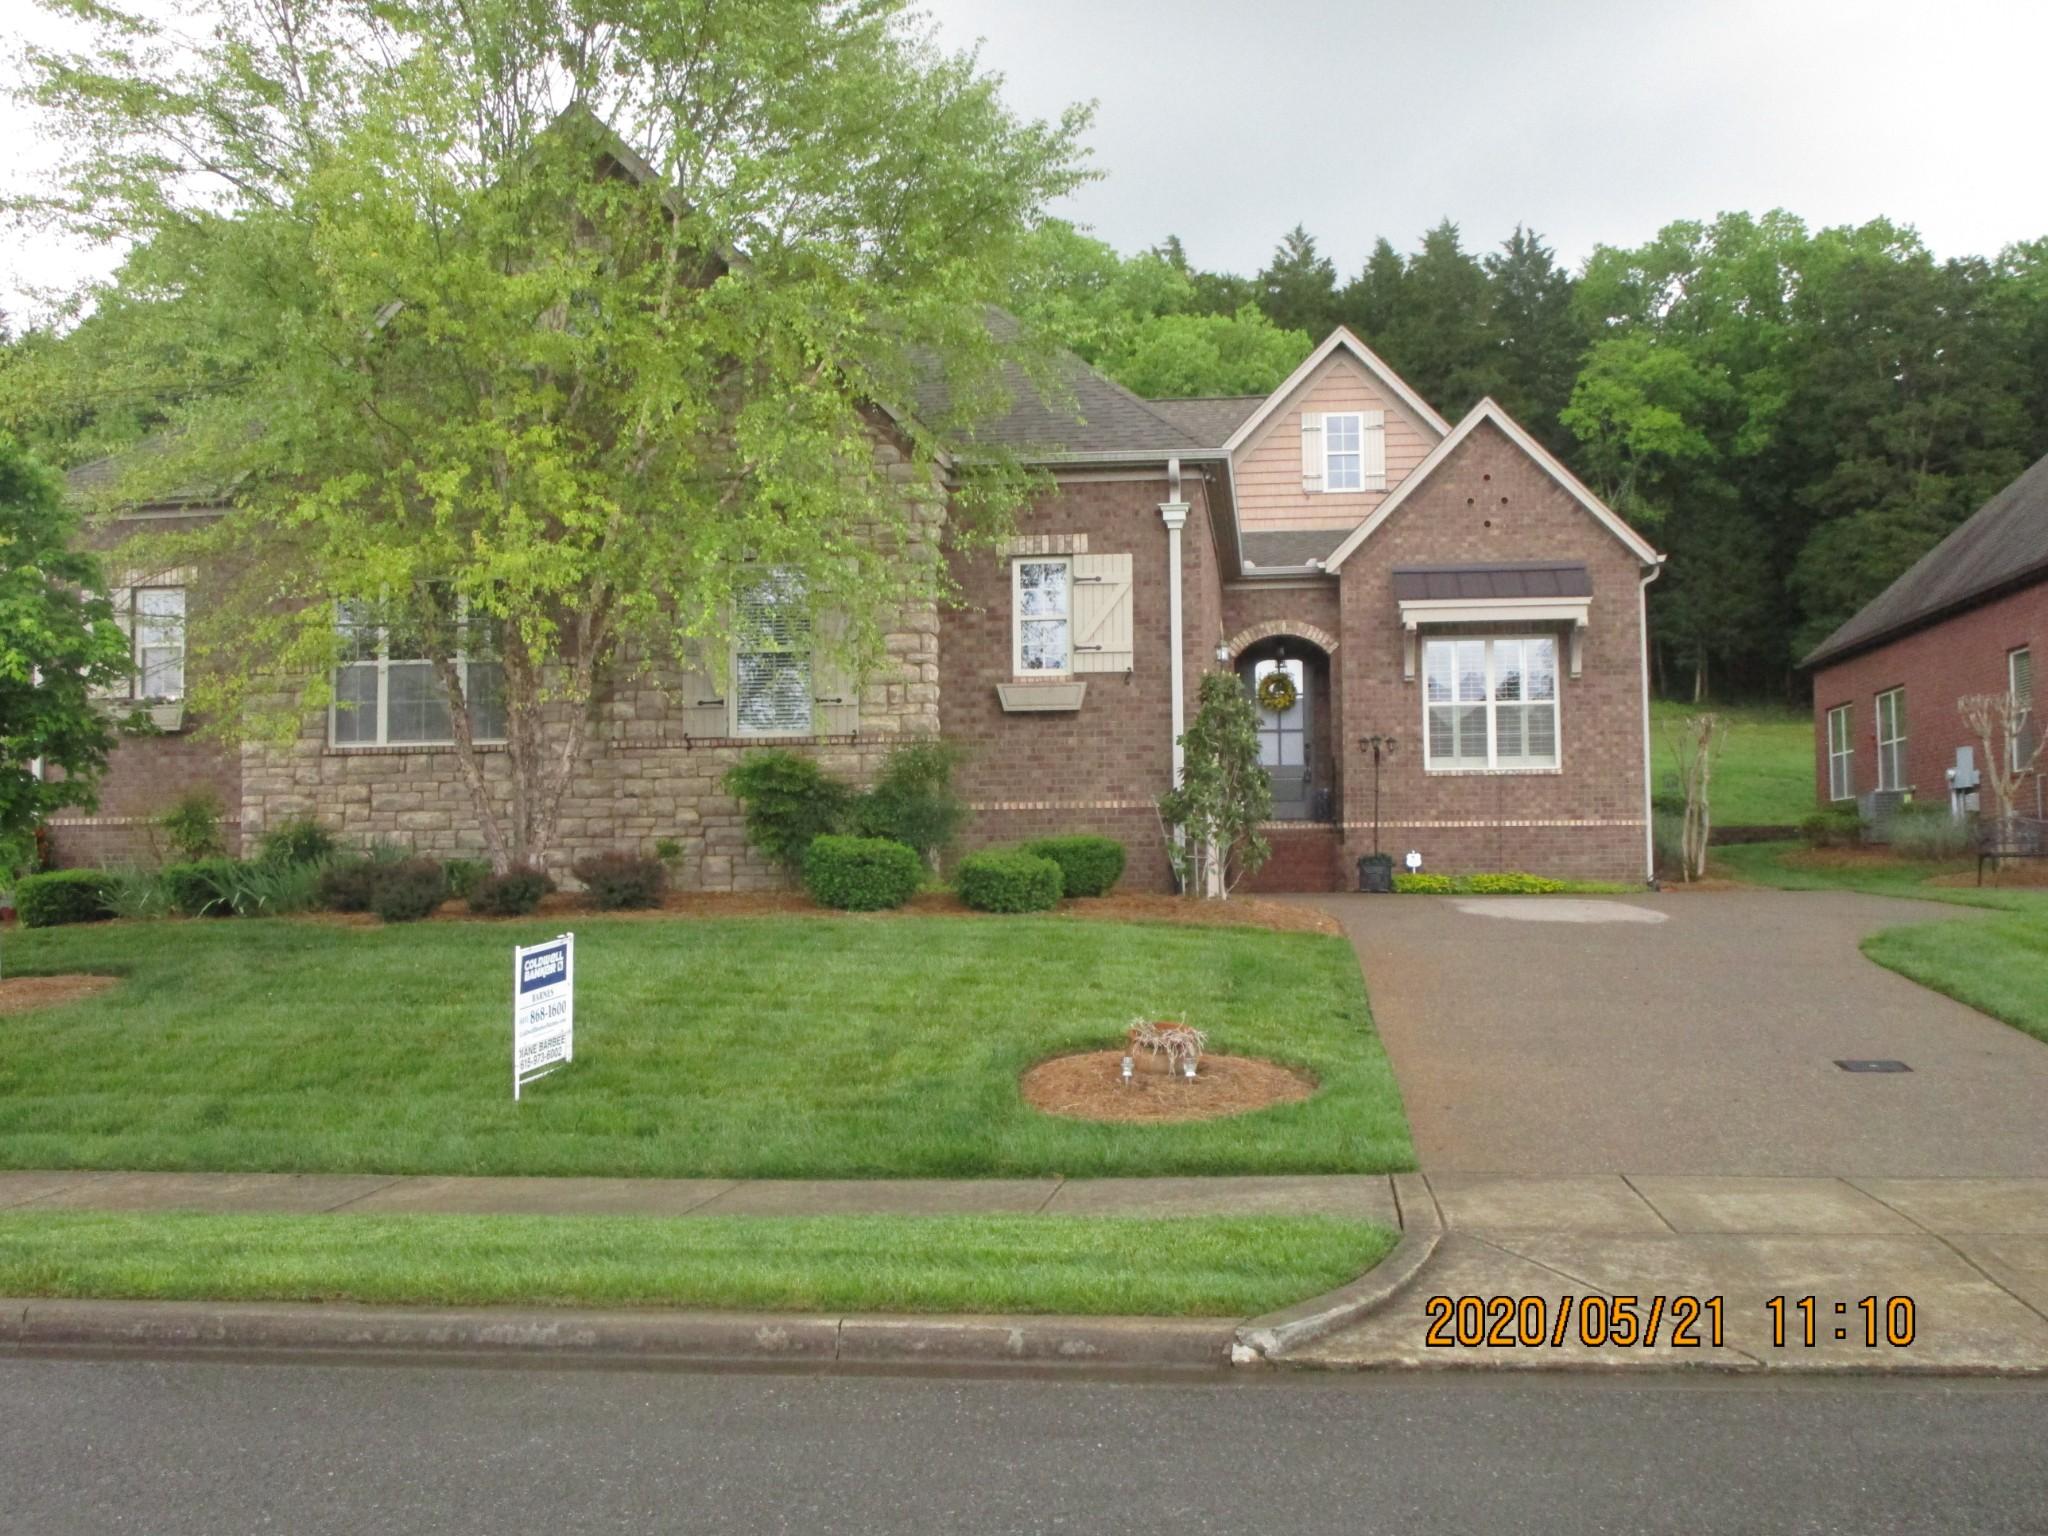 135 Tara Ln, Goodlettsville, TN 37072 - Goodlettsville, TN real estate listing